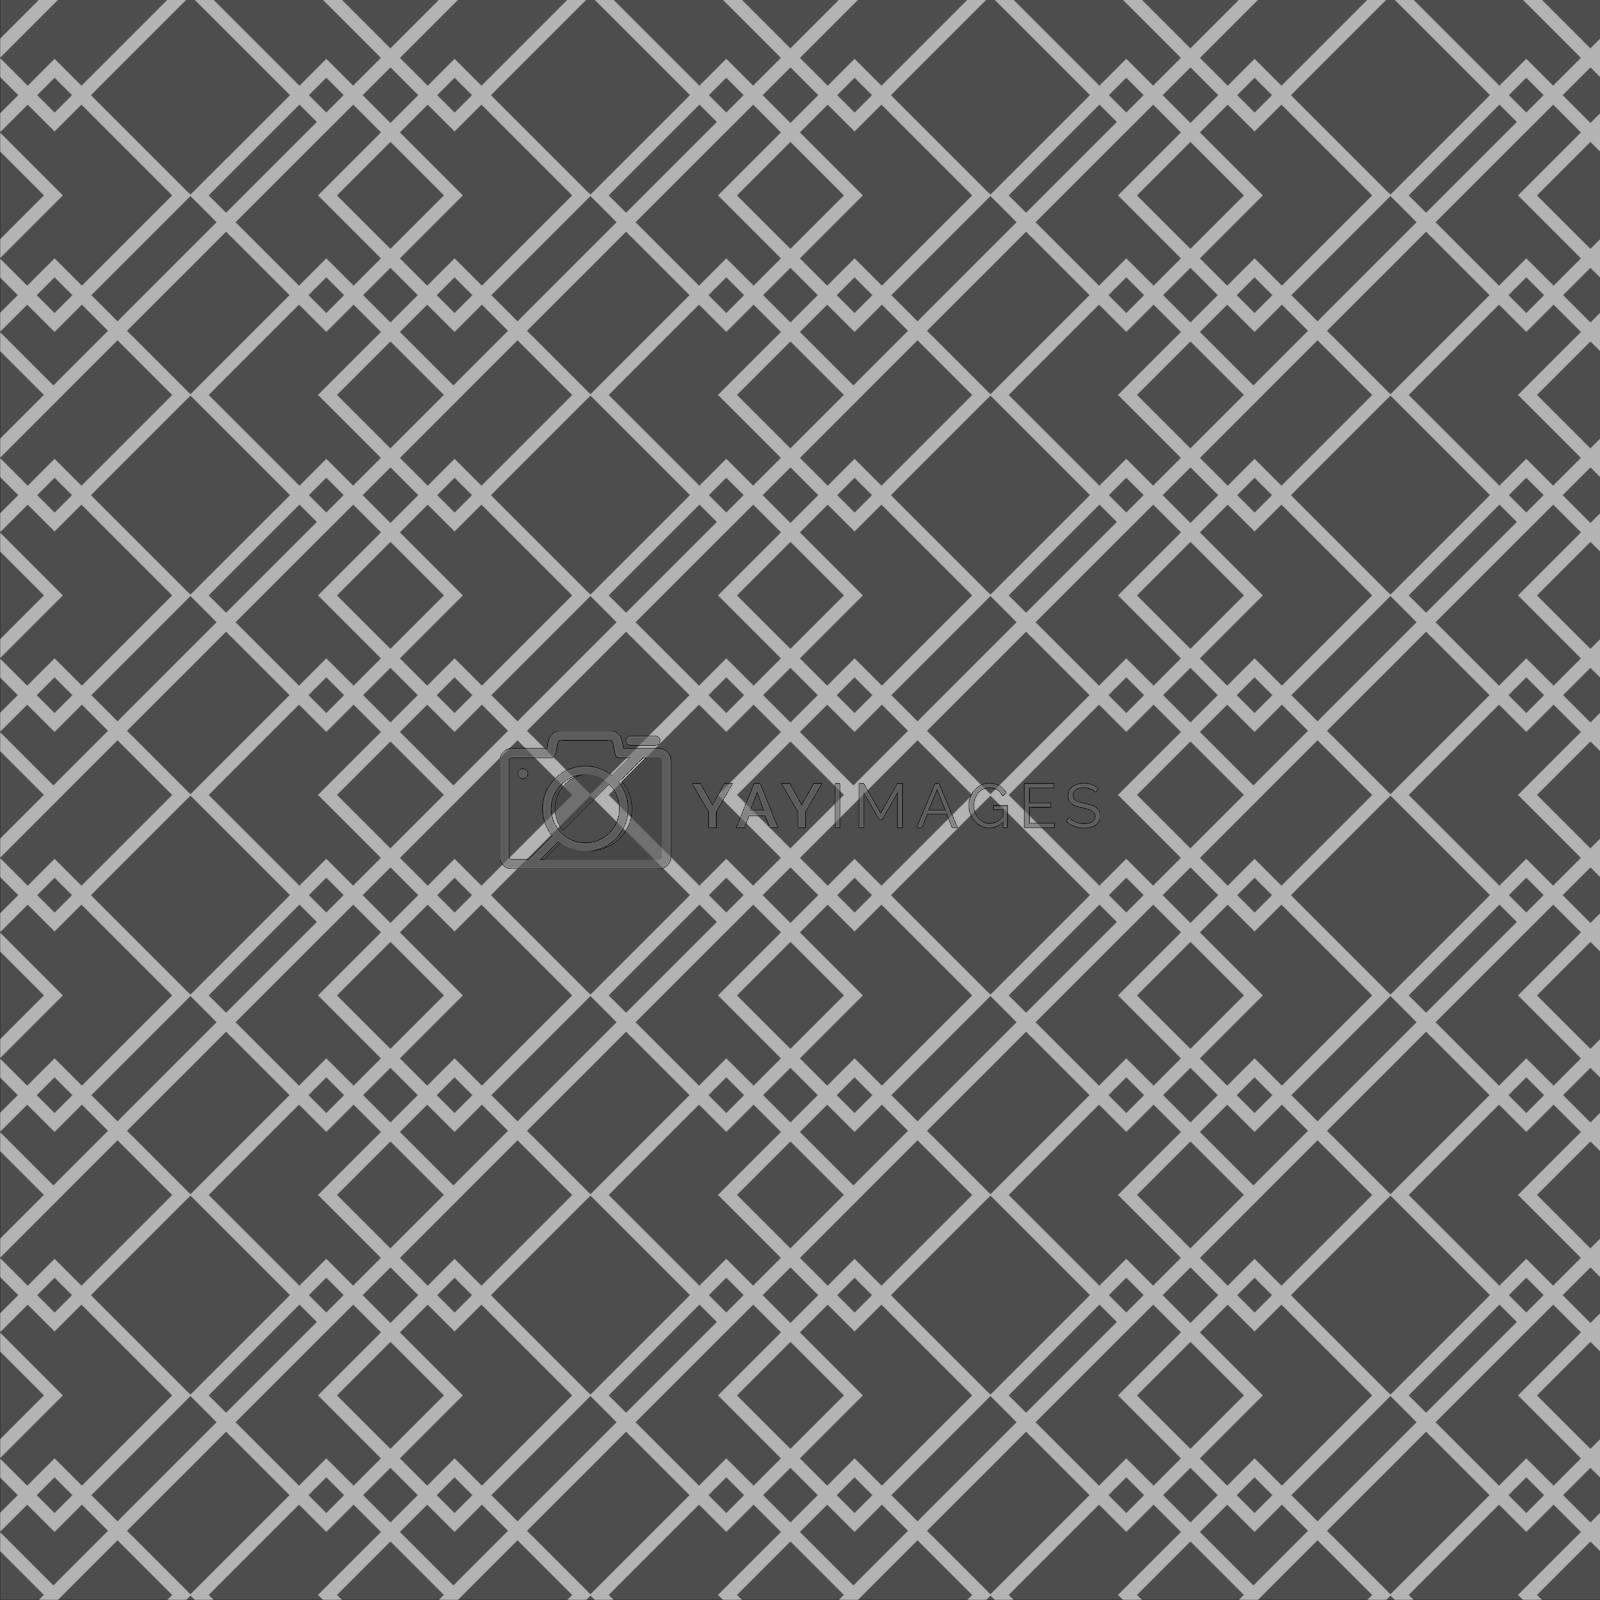 Dark mininalistic geometric seamless pattern or wallpaper with grey contour squares